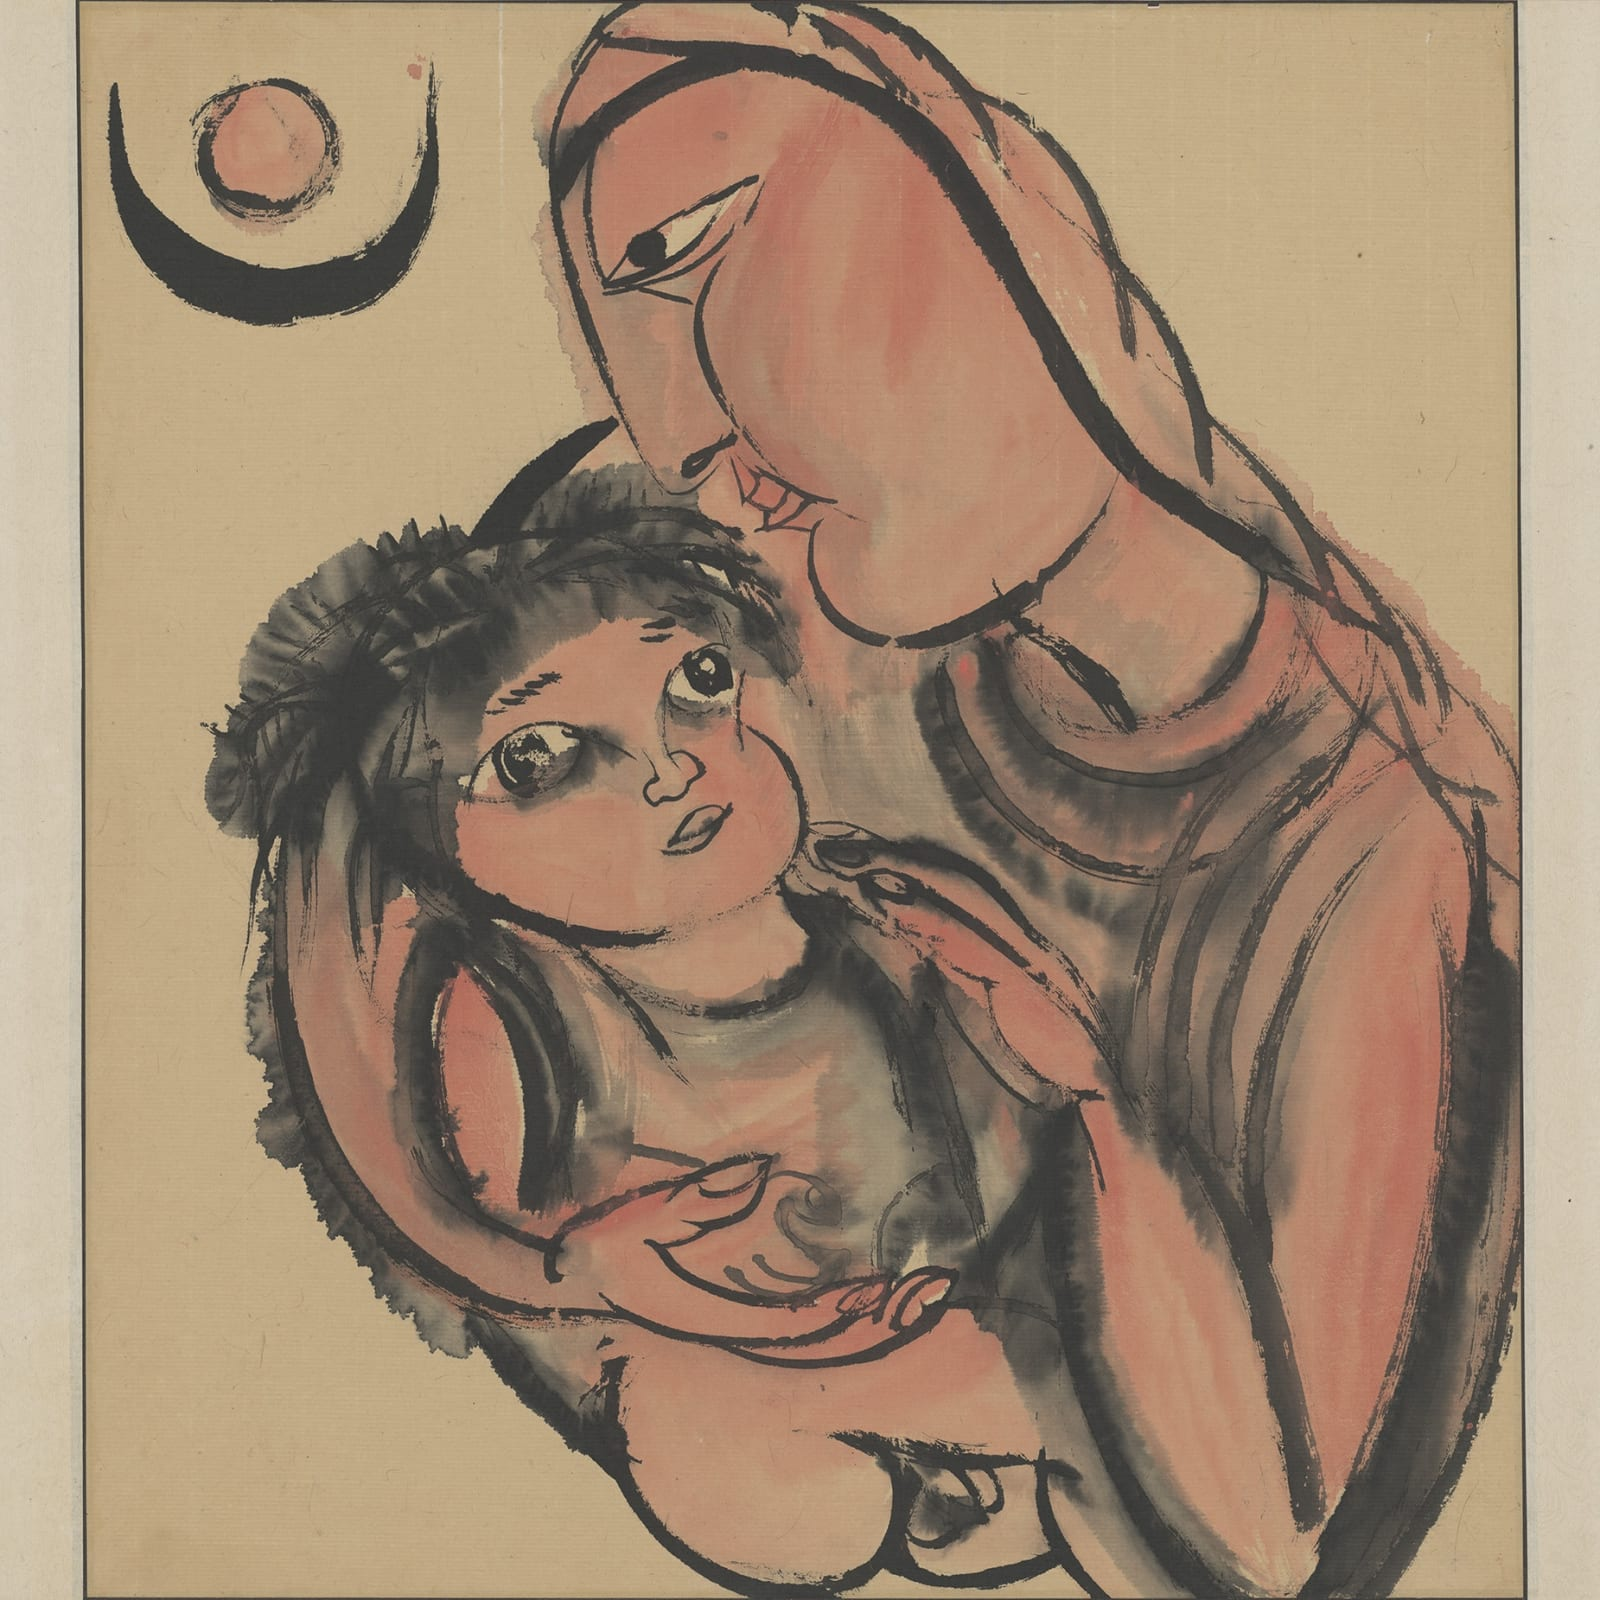 Li Jin 李津, The Tibet Series III: Breastfeeding 西藏组画之三:哺育, 1984